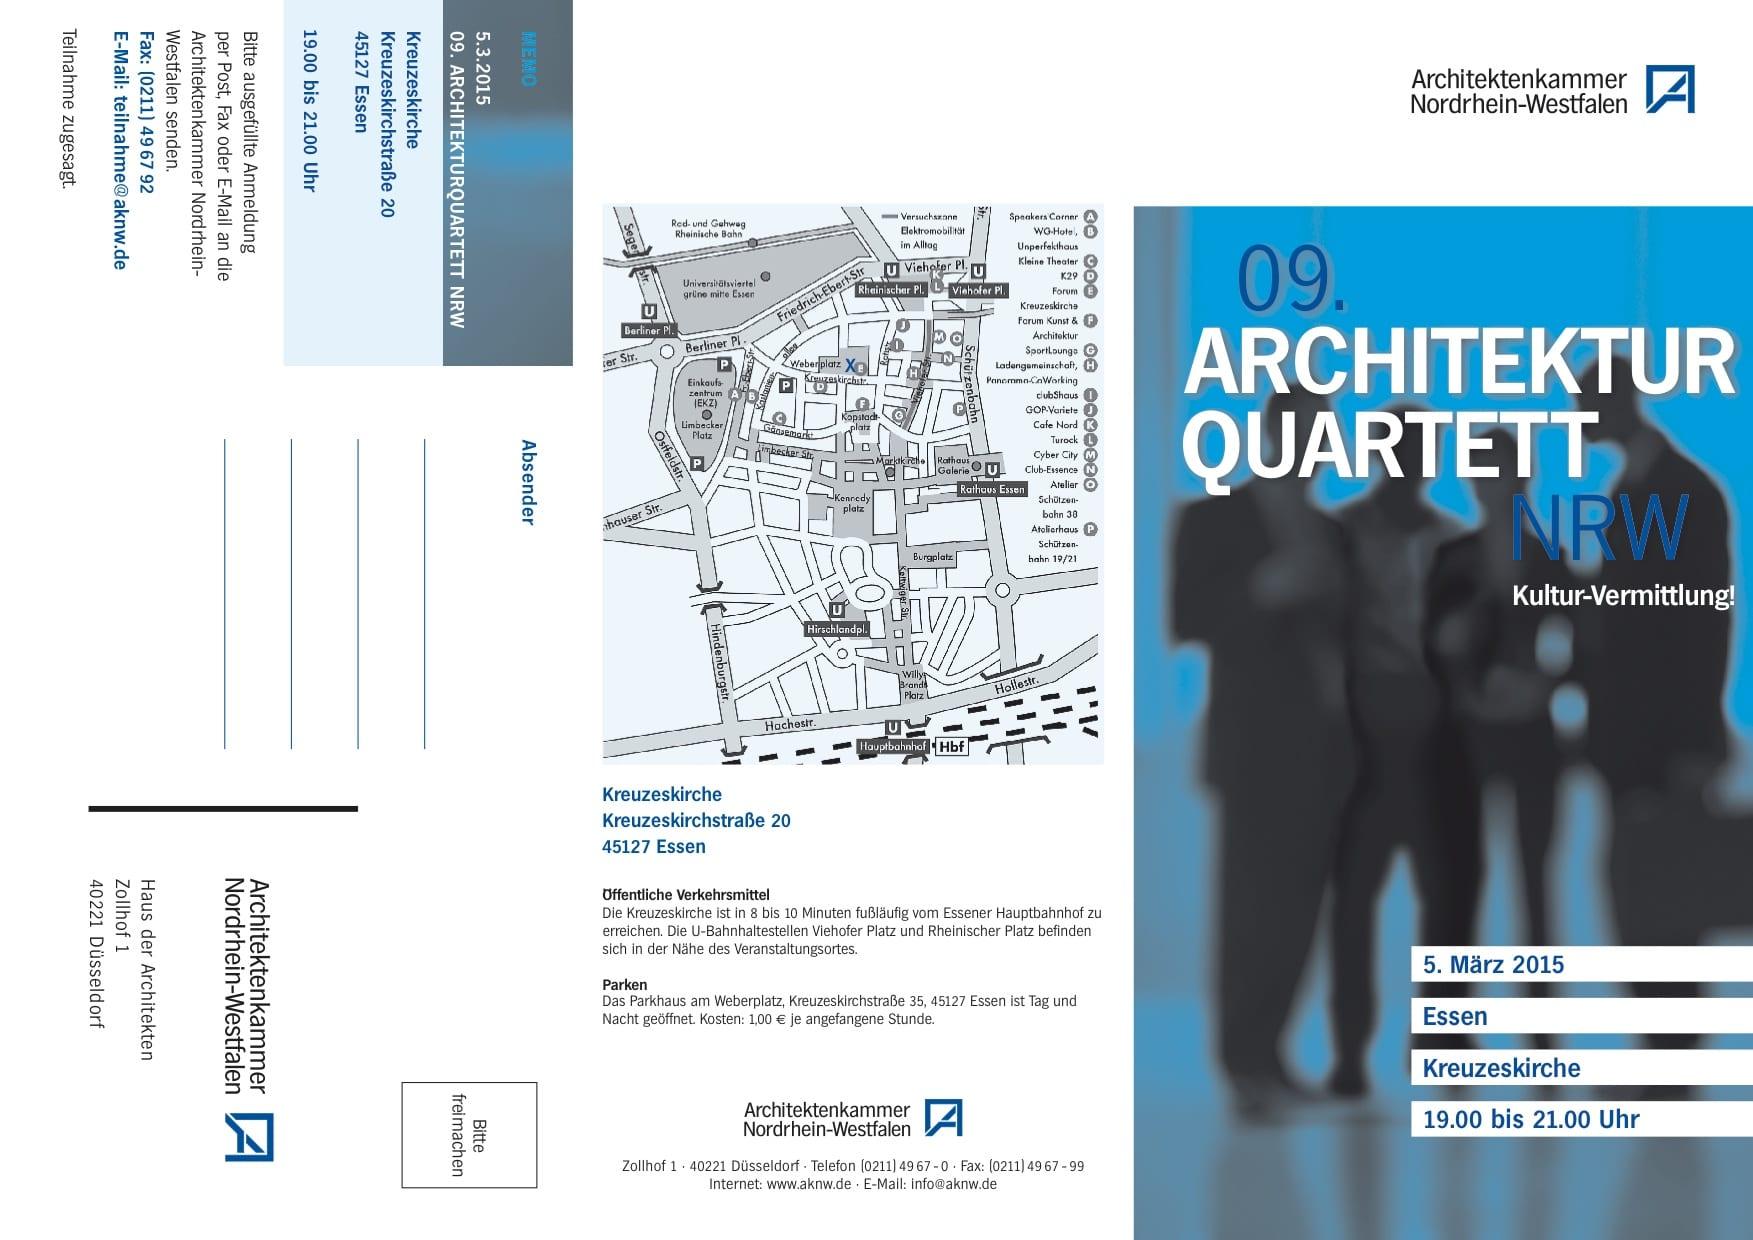 Architekturquartett_09_KulturVermittlung.jpg